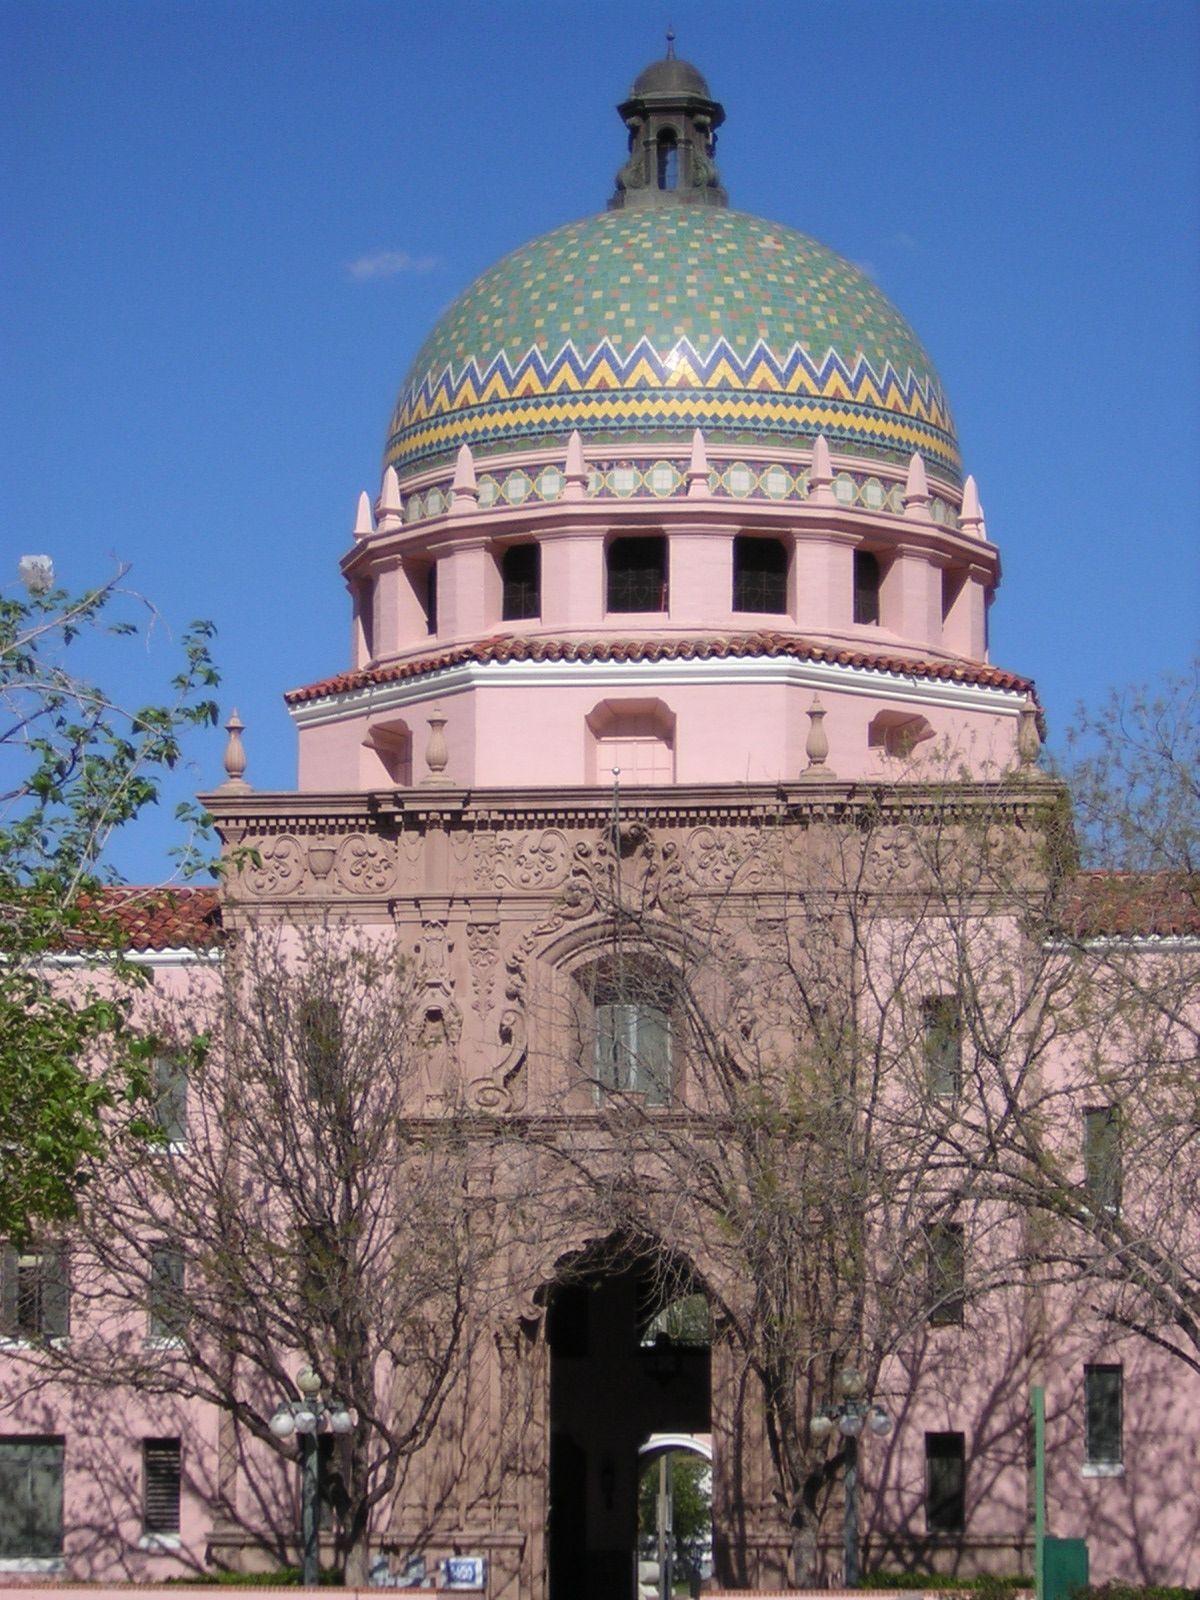 Pima County Courthouse Dome Tucson Arizona Tucson Arizona Arizona State Of Arizona Pima county consolidated justice court. pima county courthouse dome tucson